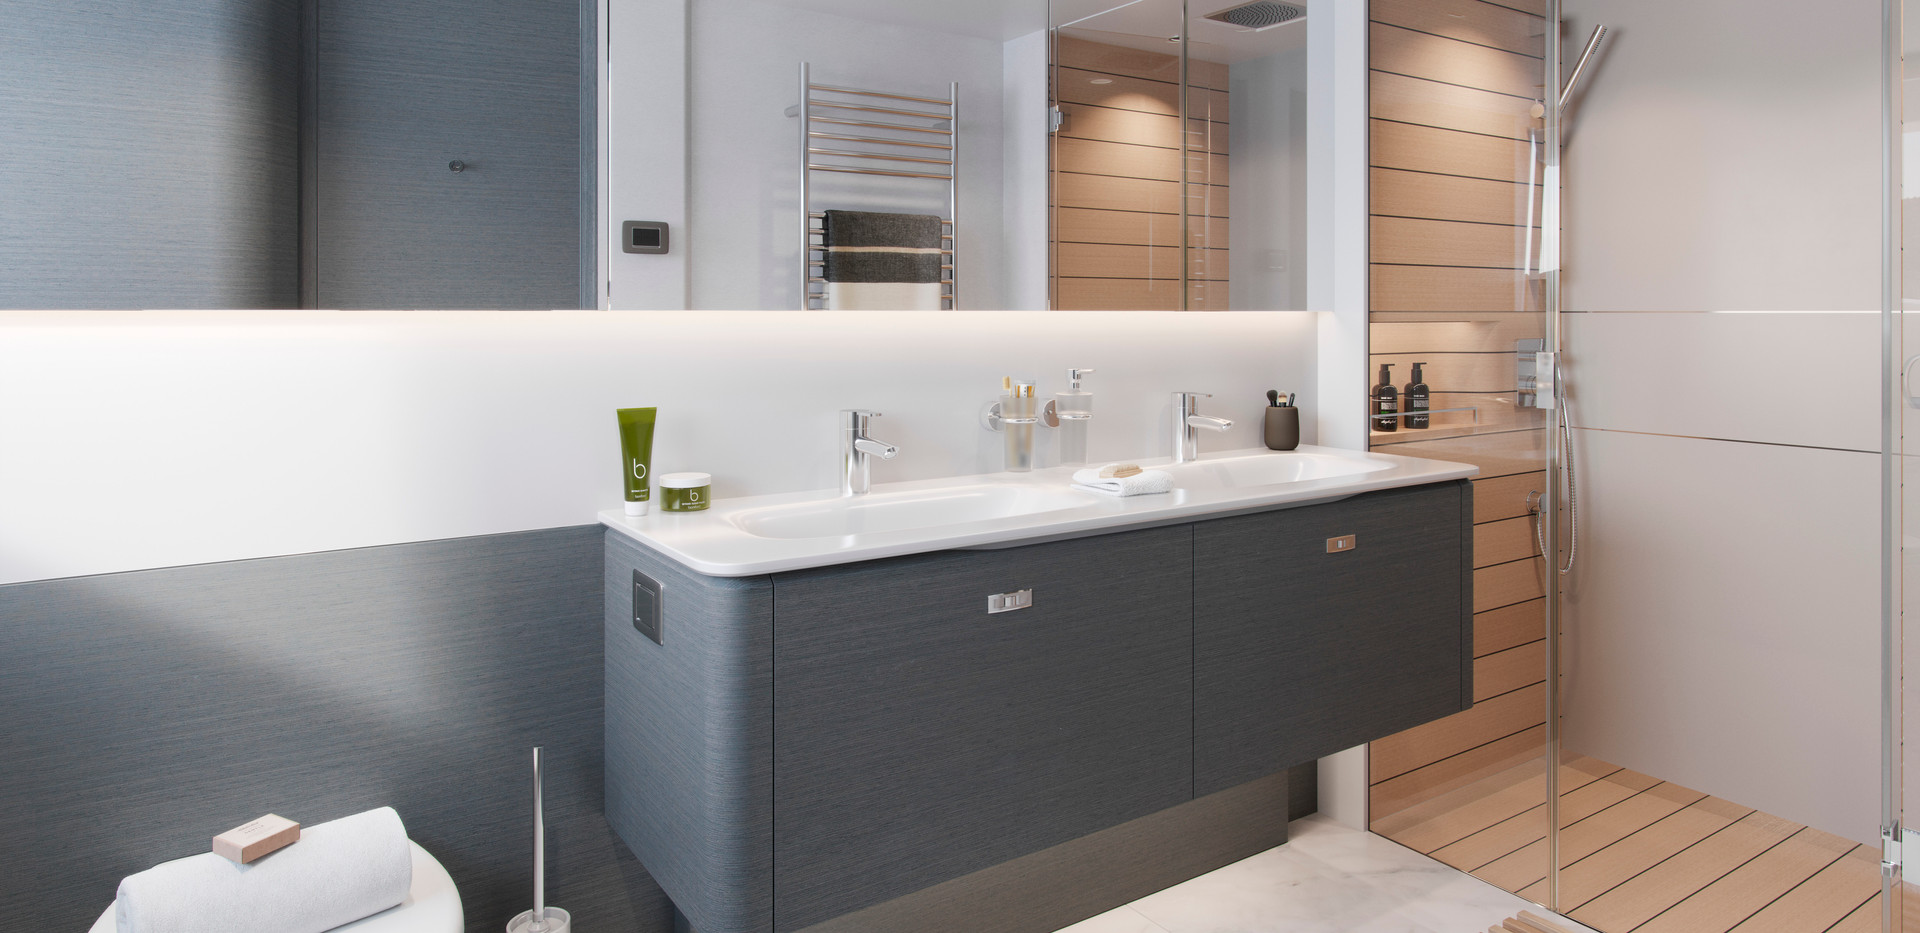 x80-interior-master-bathroom-cgi.jpg